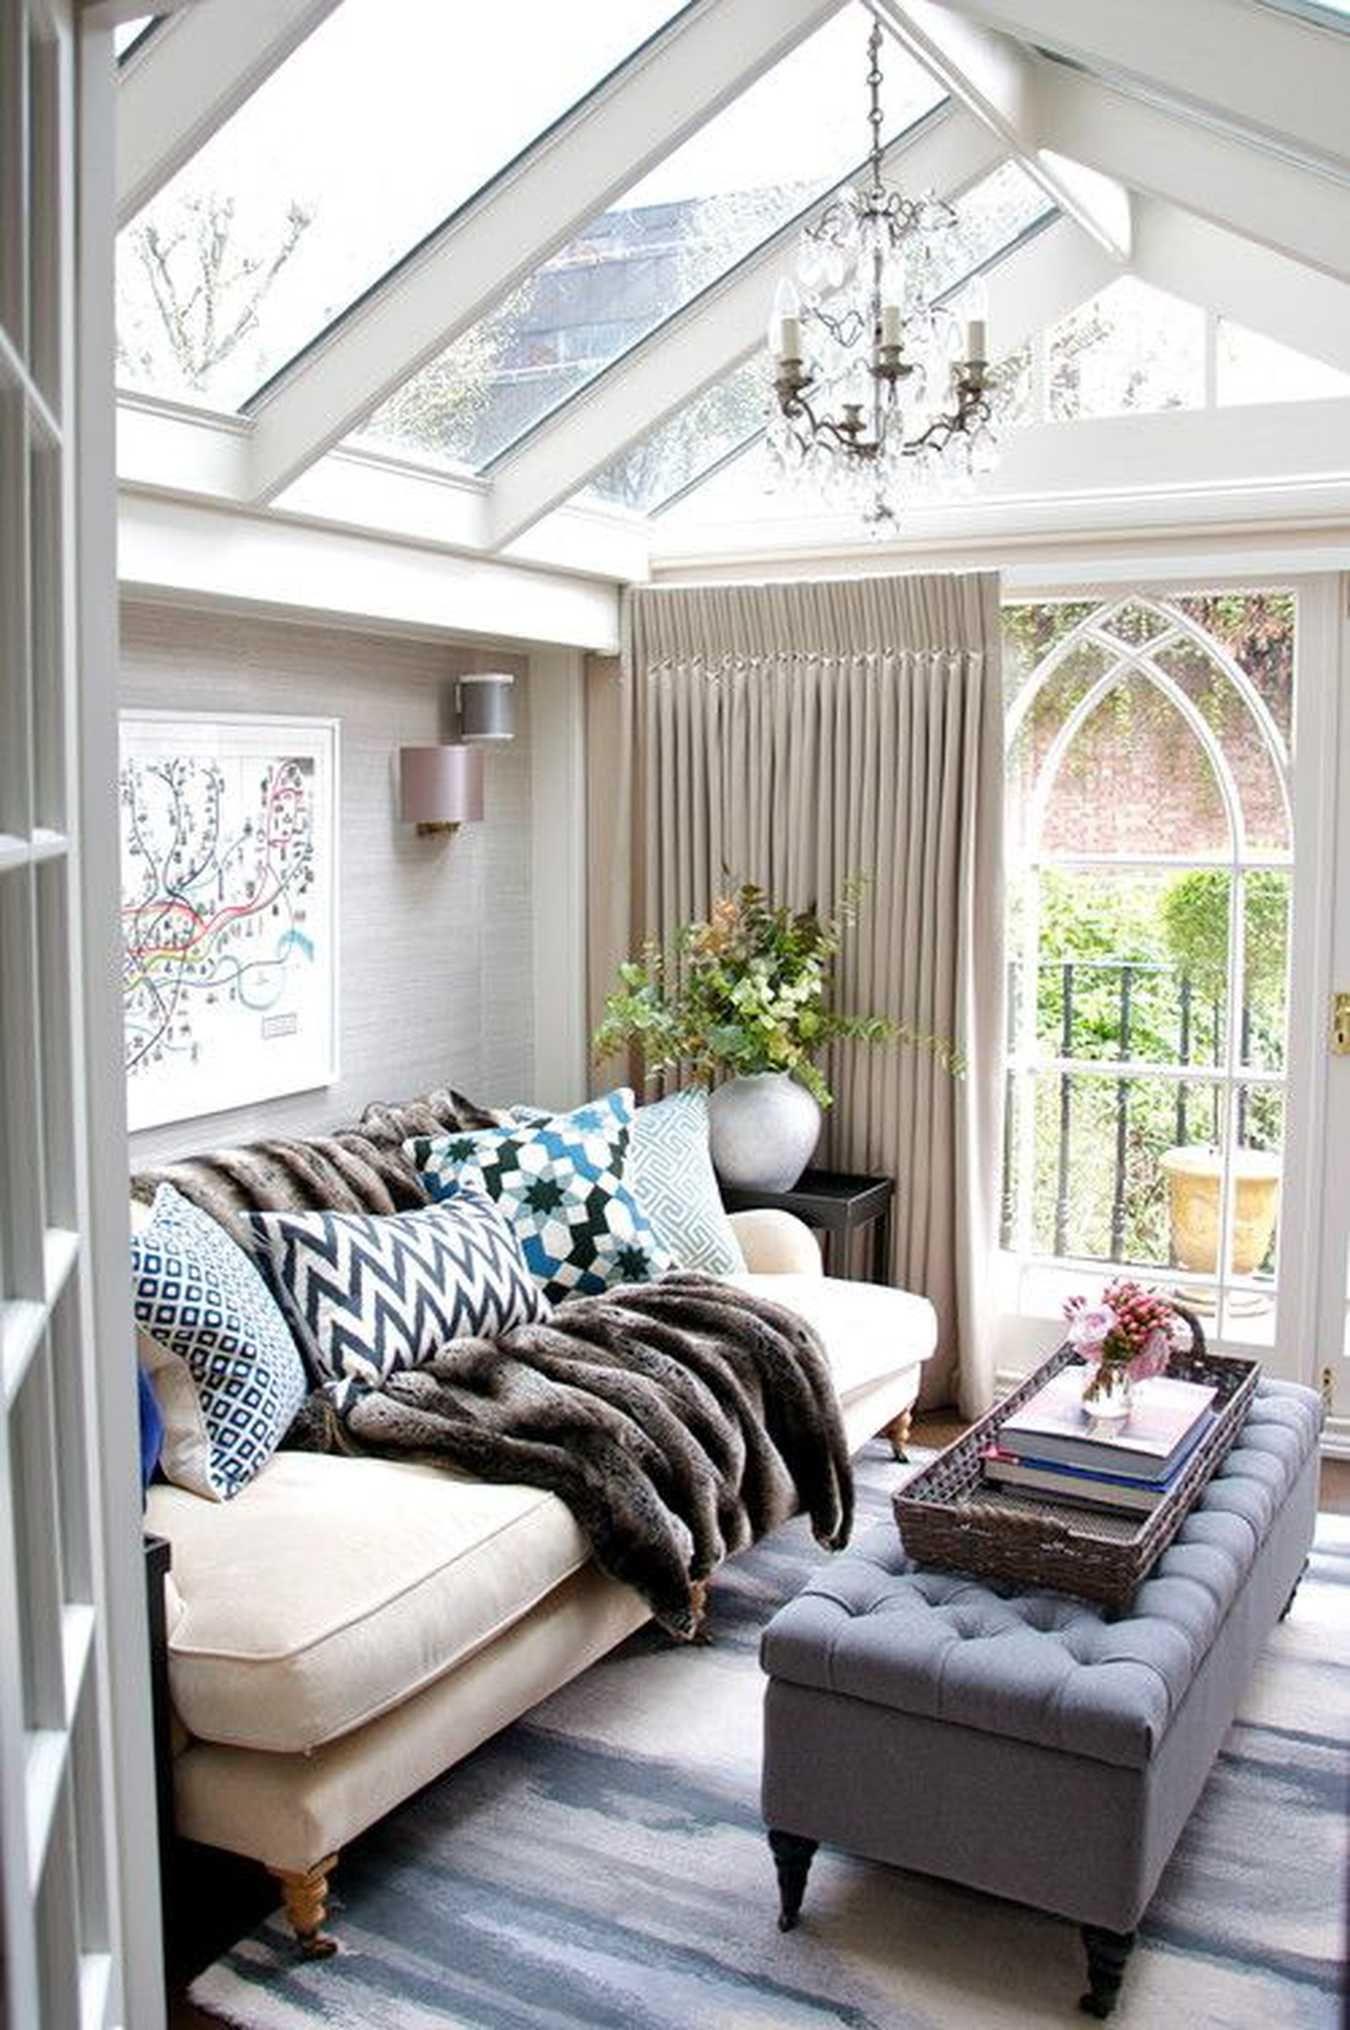 Interior Design Style Quiz | Sunroom designs, Home decor